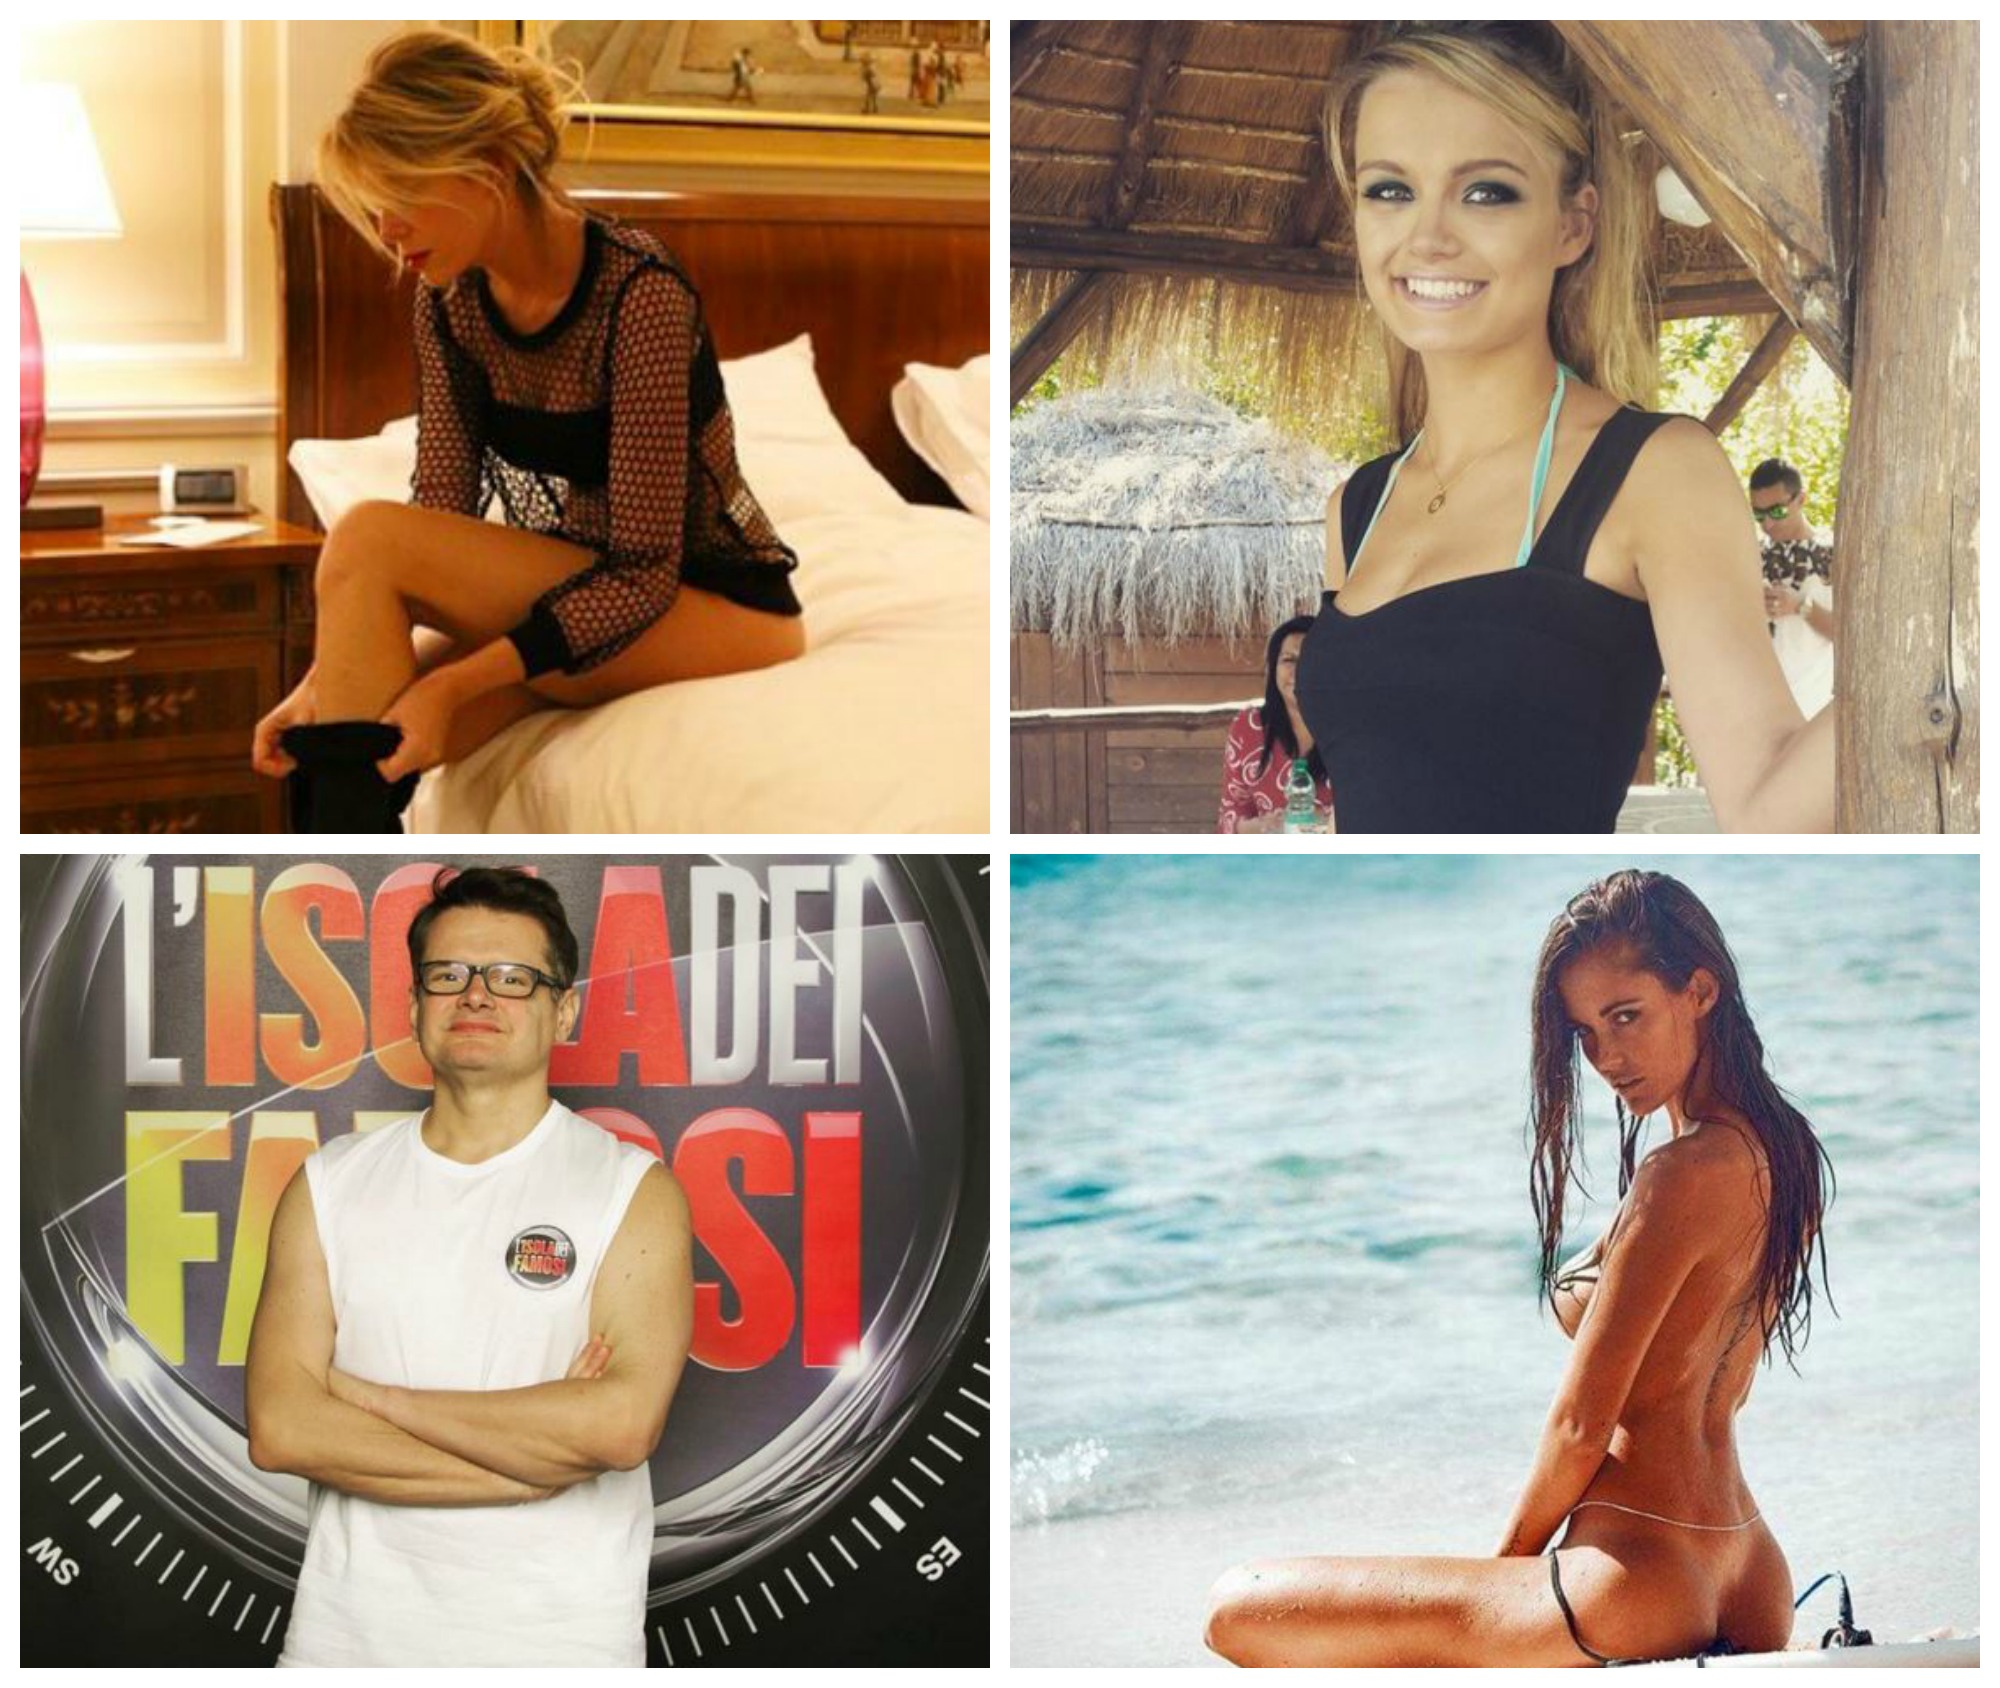 Alessia-Marcuzzi-Mercedesz-Henger-Aristide-Malnati-e-Gracia-De-Torres-Foto-Instagram